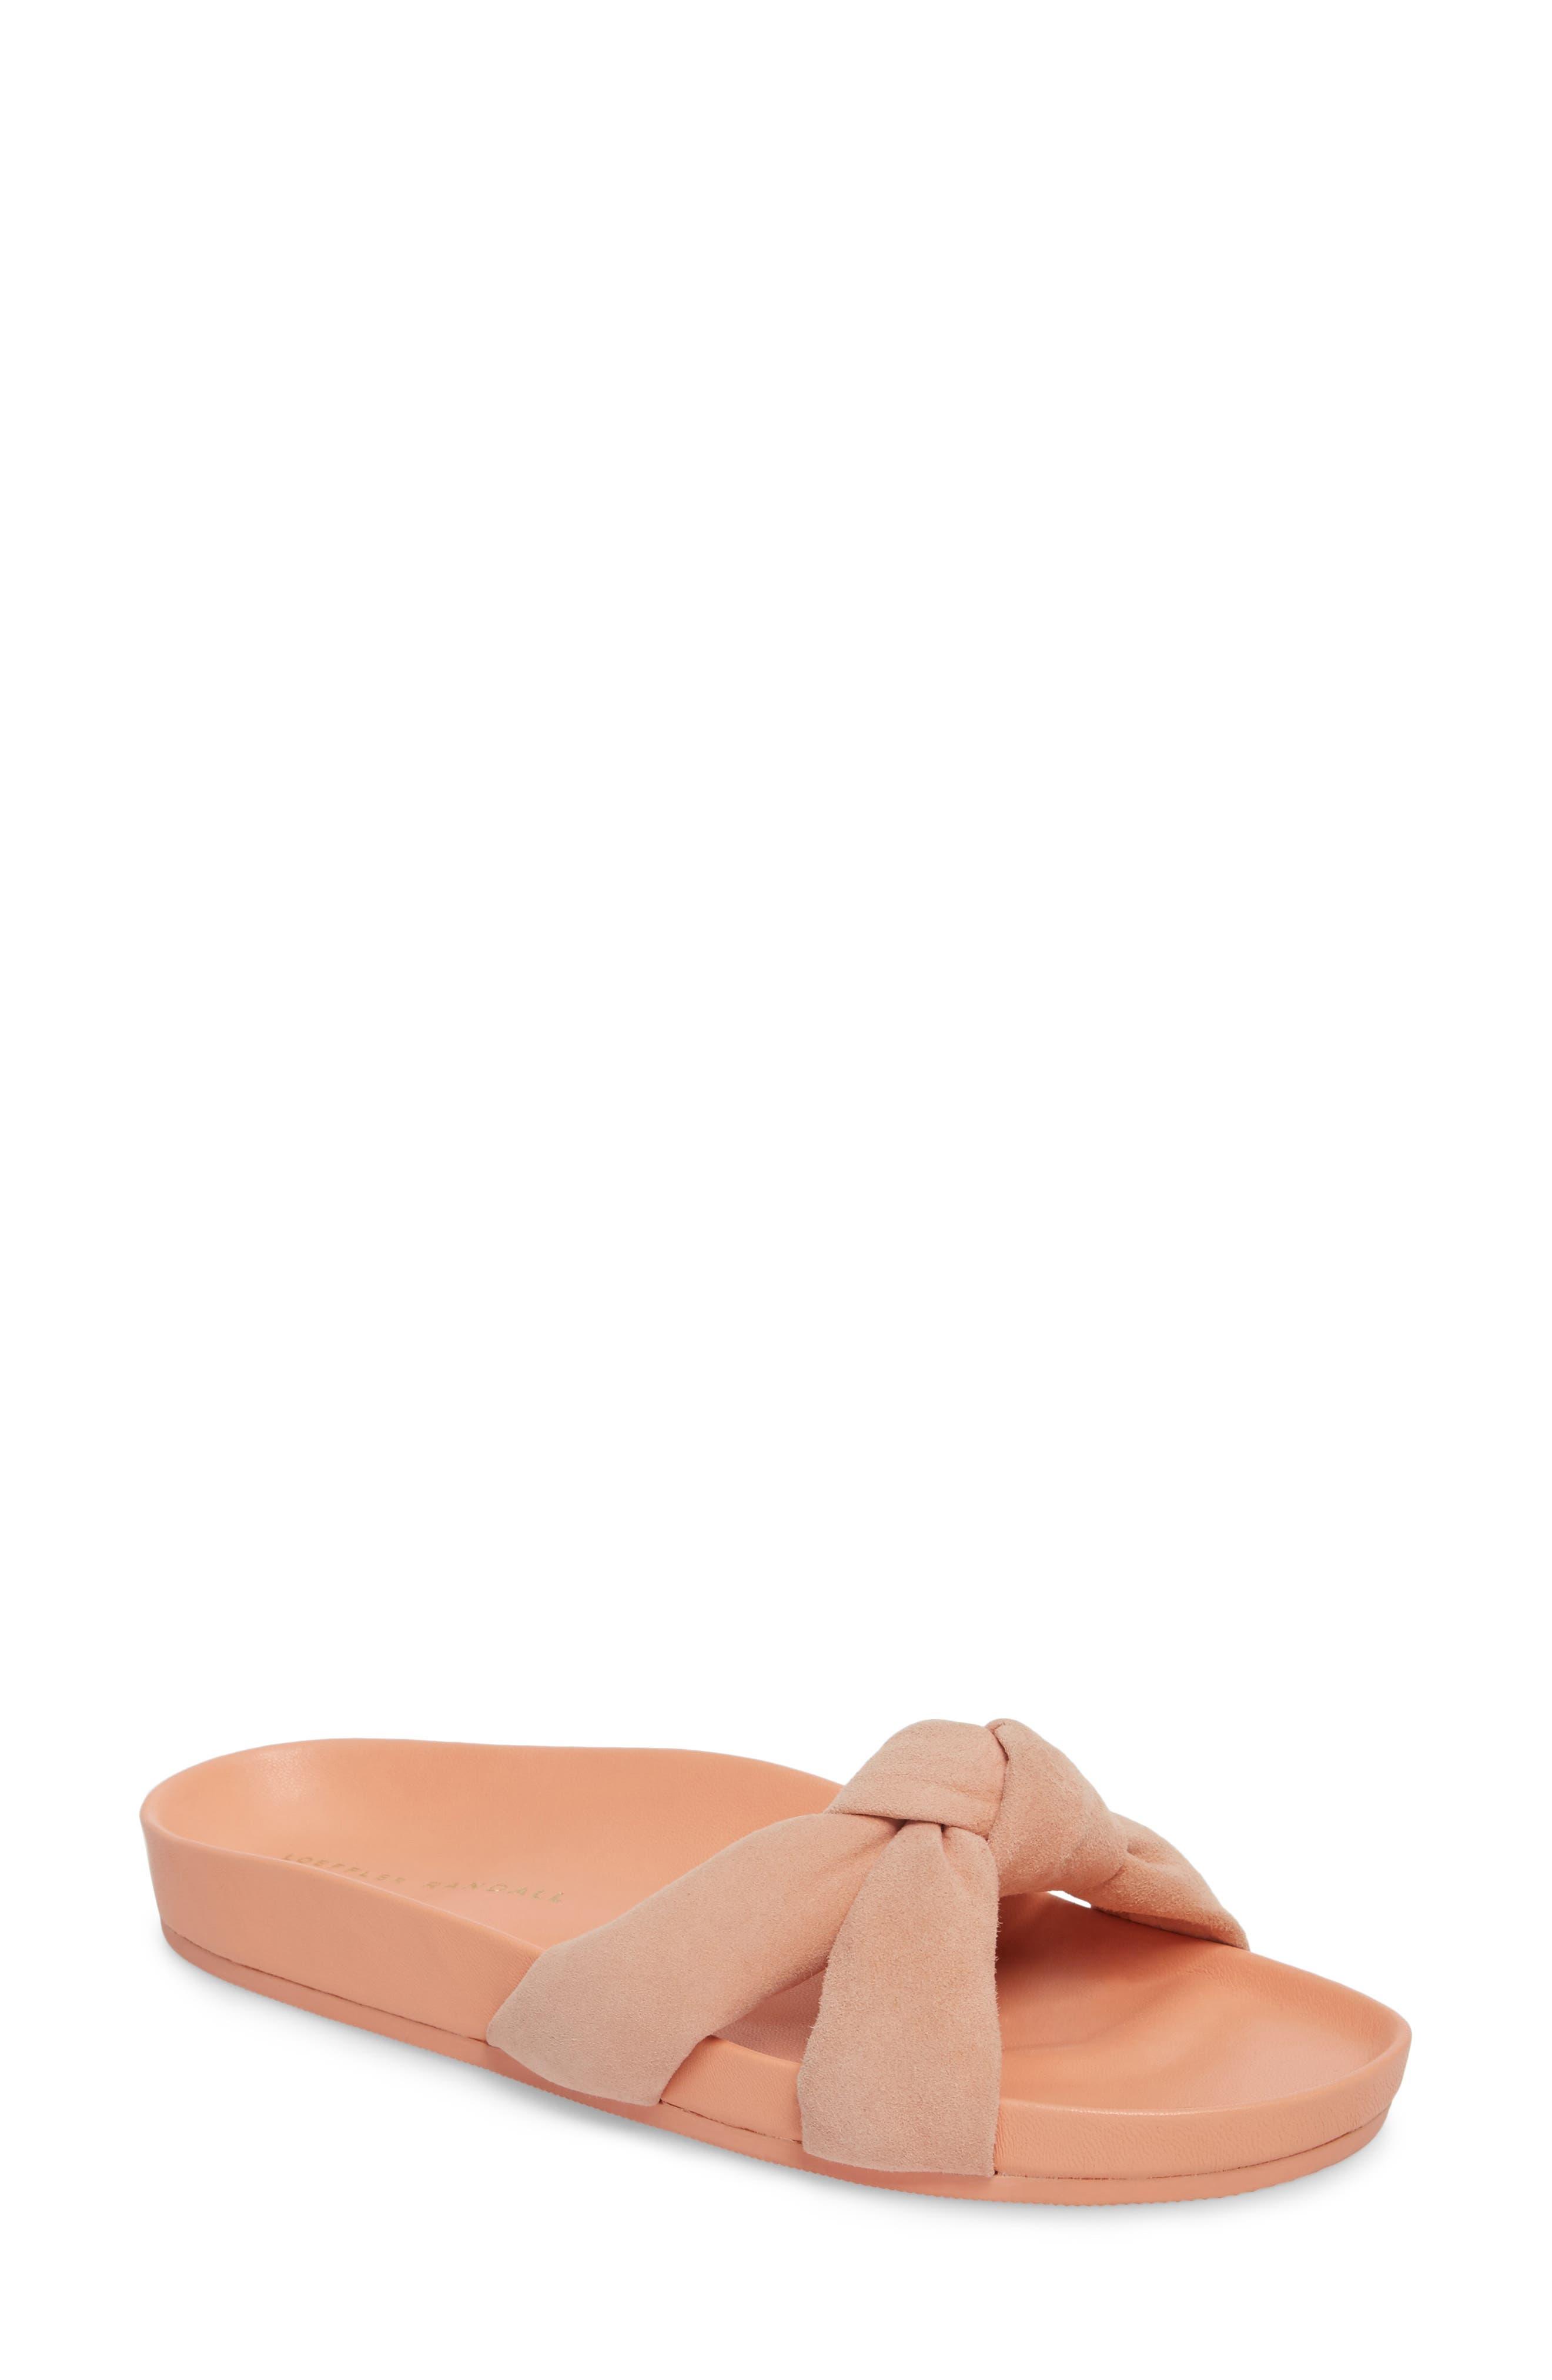 Gertie Knotted Slide Sandal,                         Main,                         color, MELON